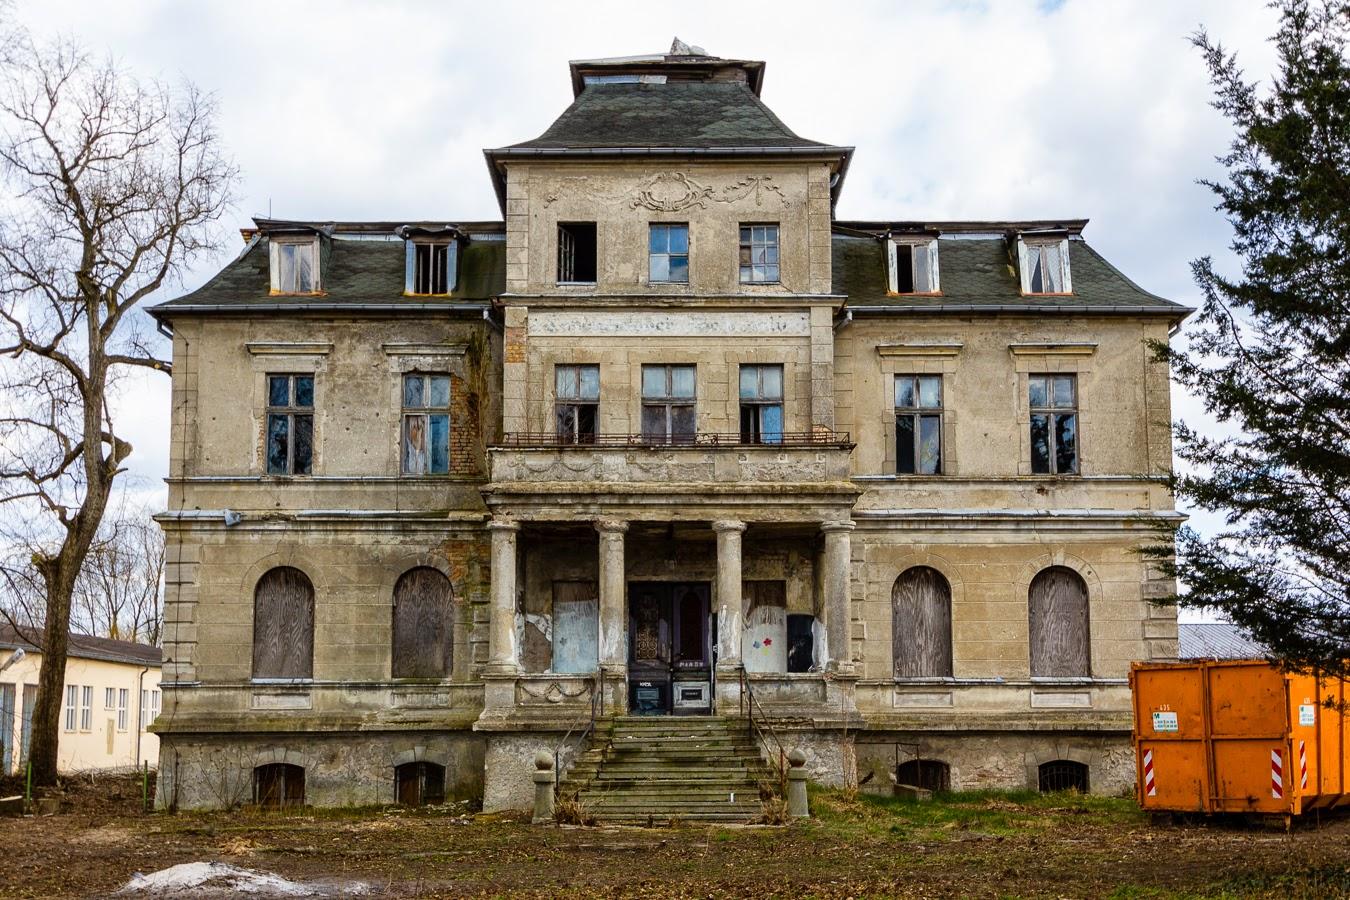 Abandonedberlin.com